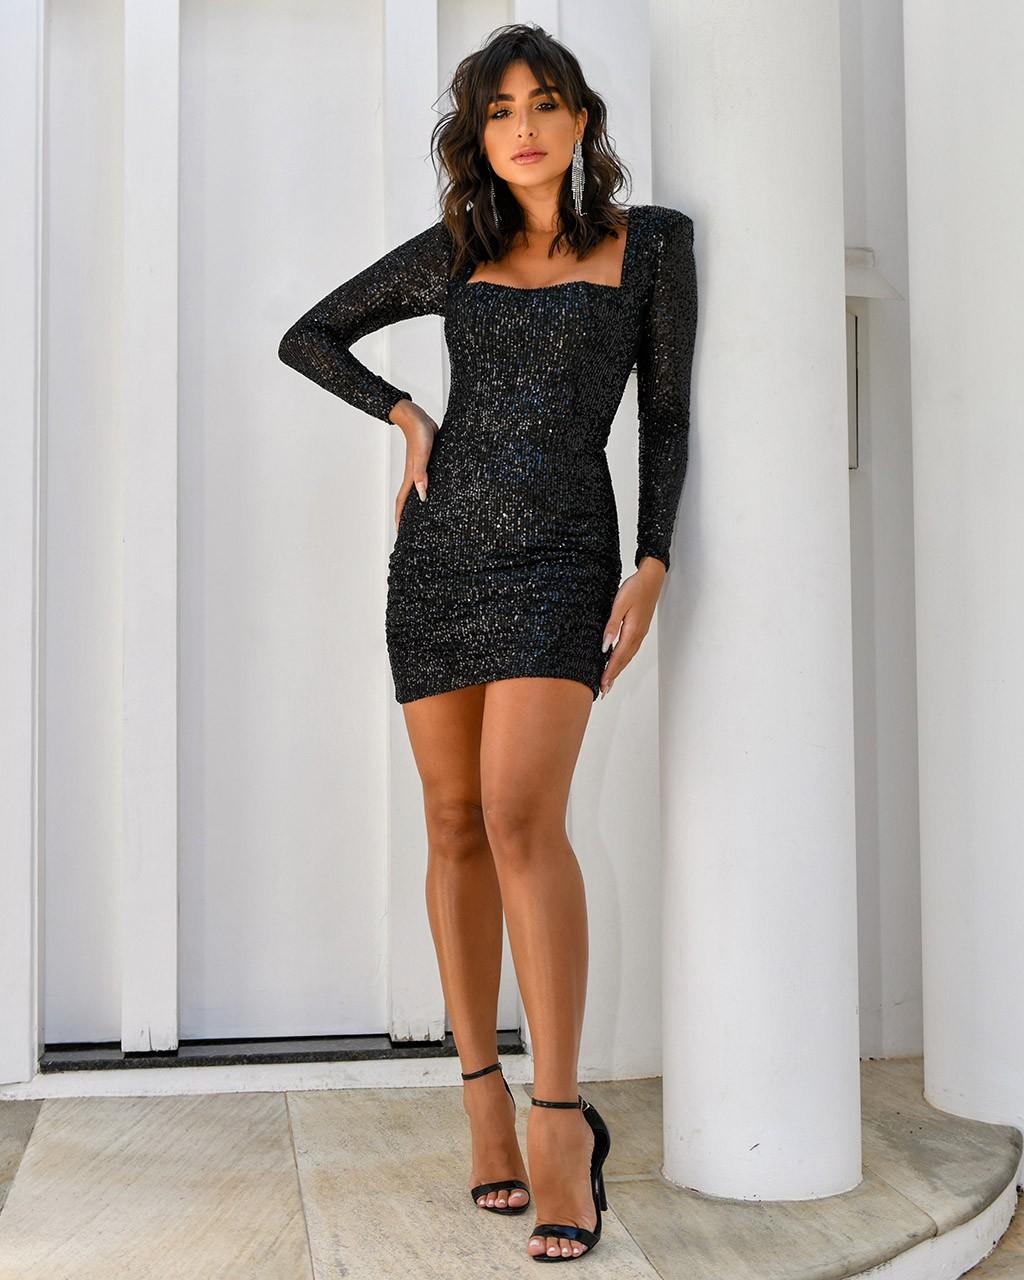 Vestido Kiara  - Empório NM